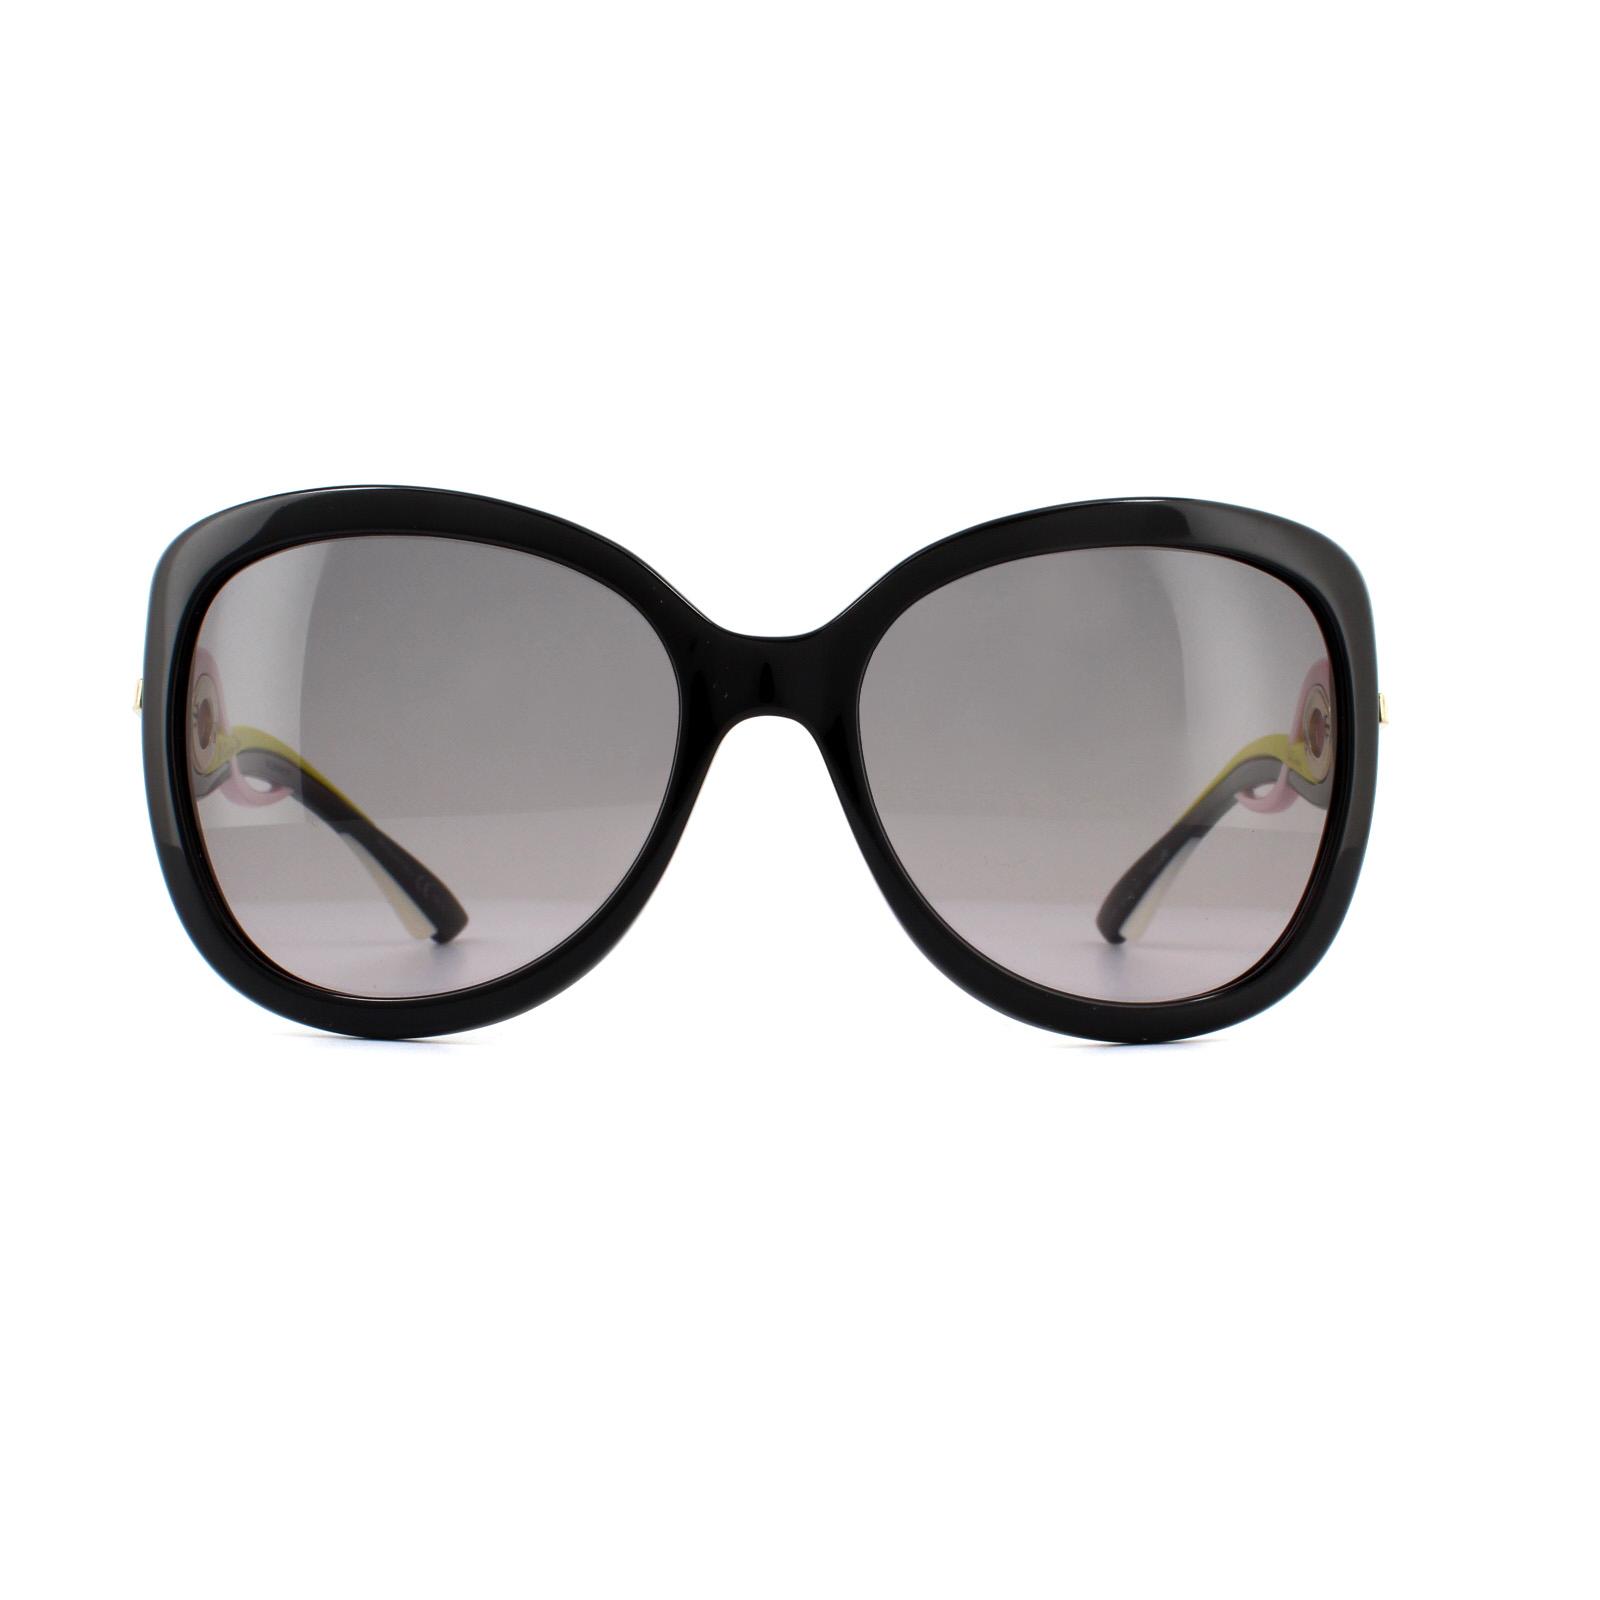 e07cc1687813 Sentinel Dior Sunglasses Dior Twisting JXG EU Black Pink Yellow Grey  Gradient